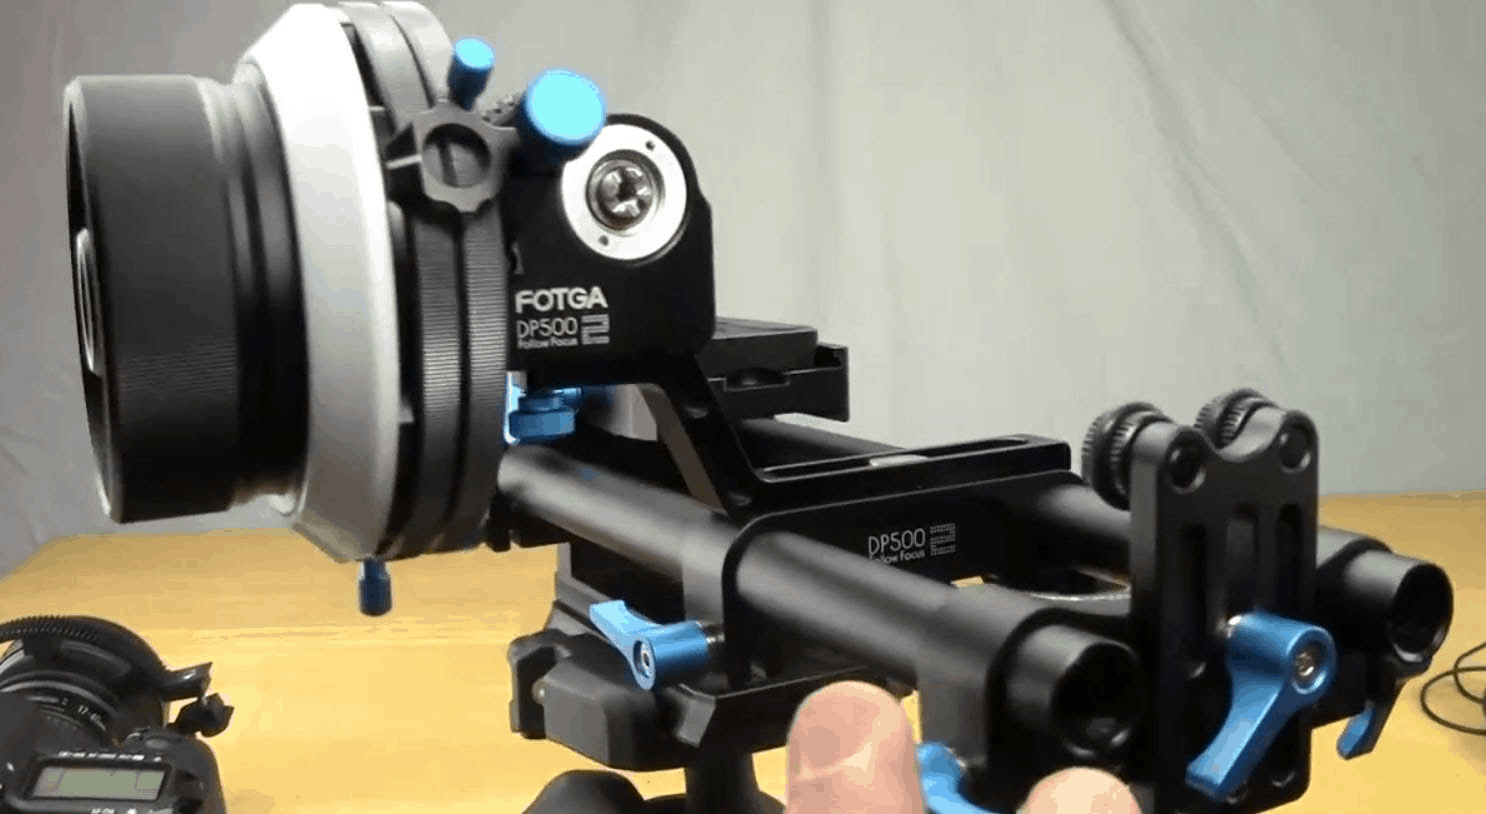 Five Top Equipment Upgrades For Start-up Filmmakers 1 - Florida Independent